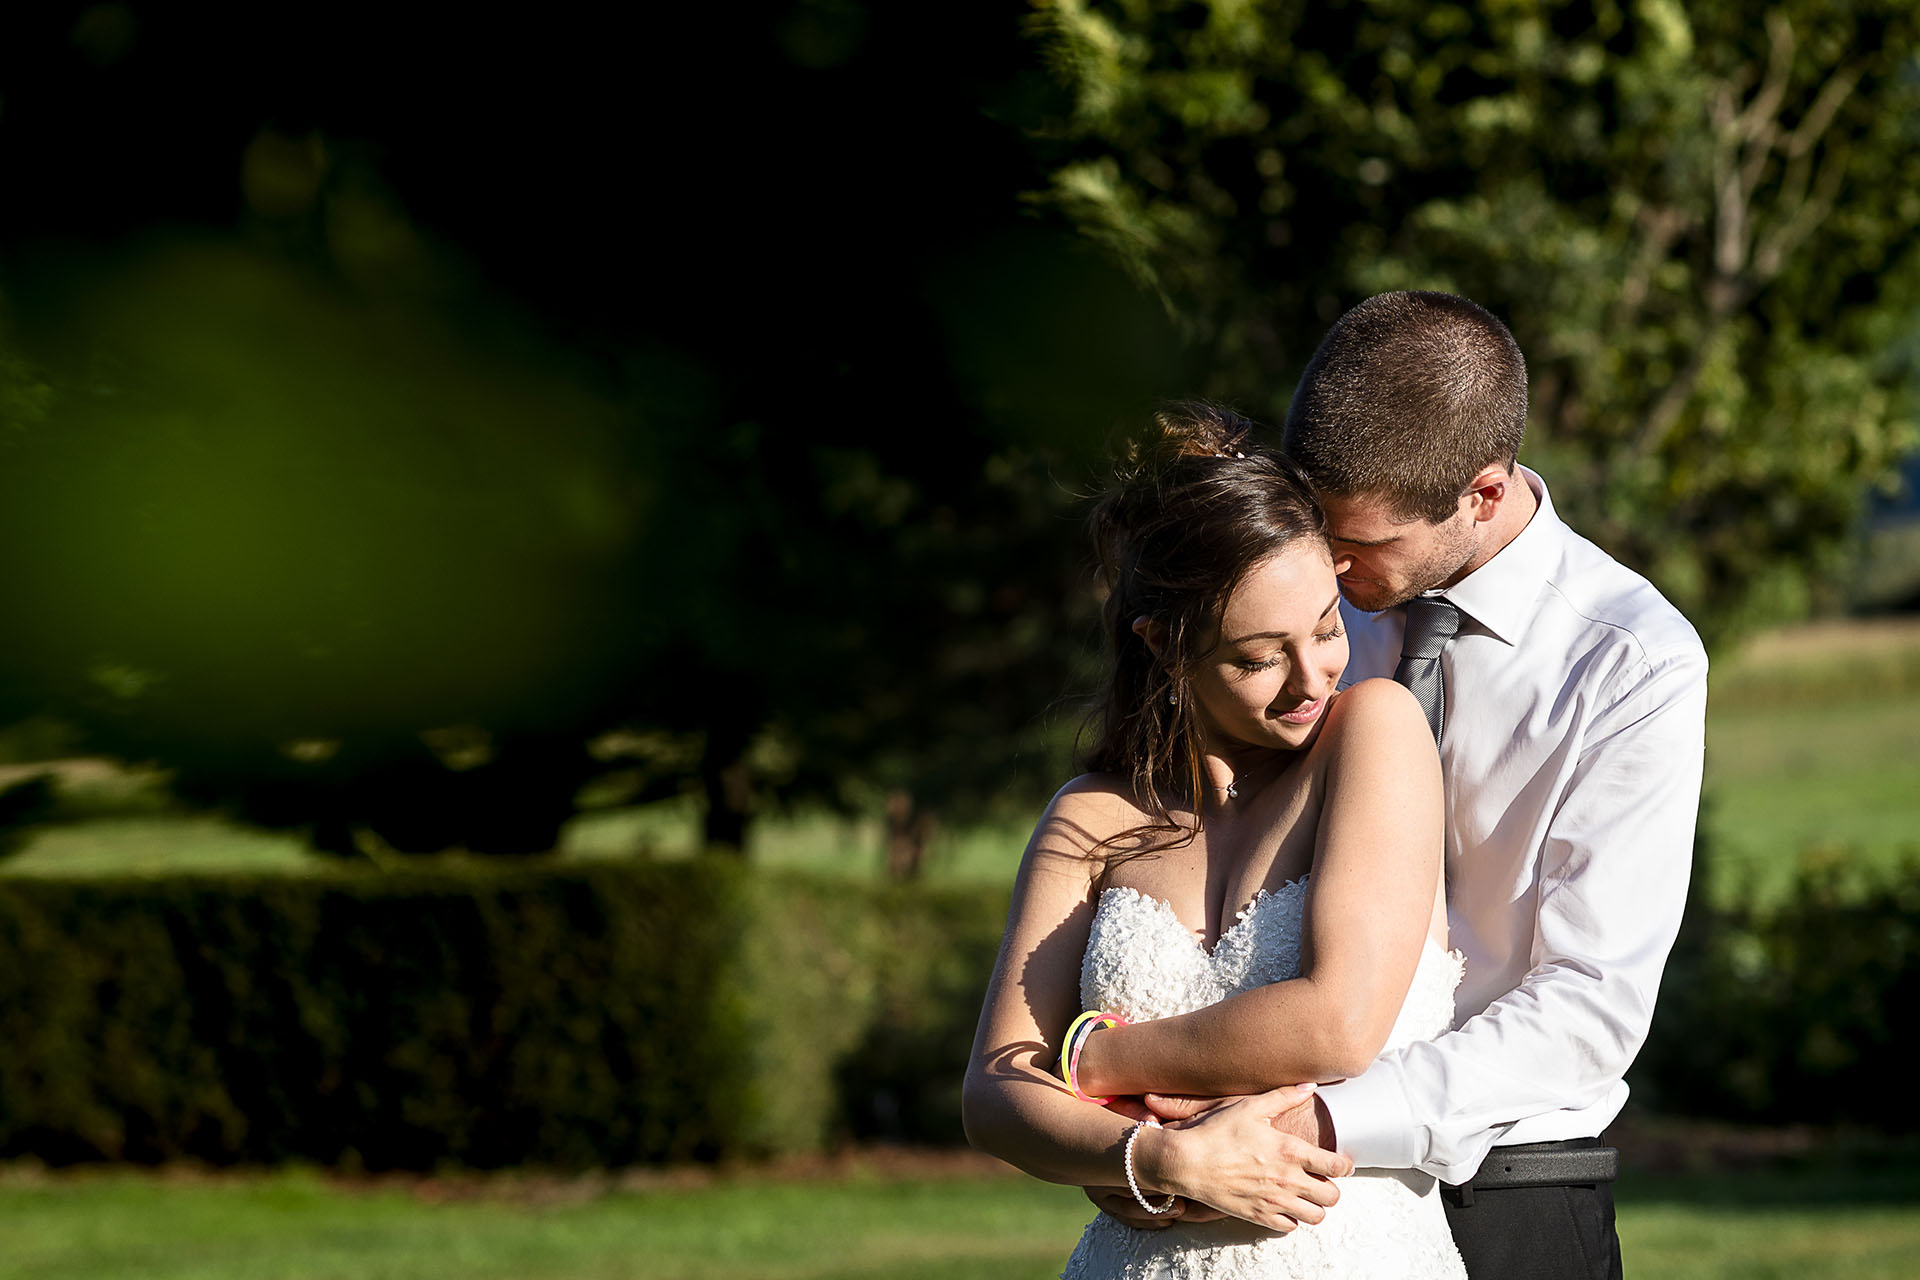 Wedding locations - La Fiorida